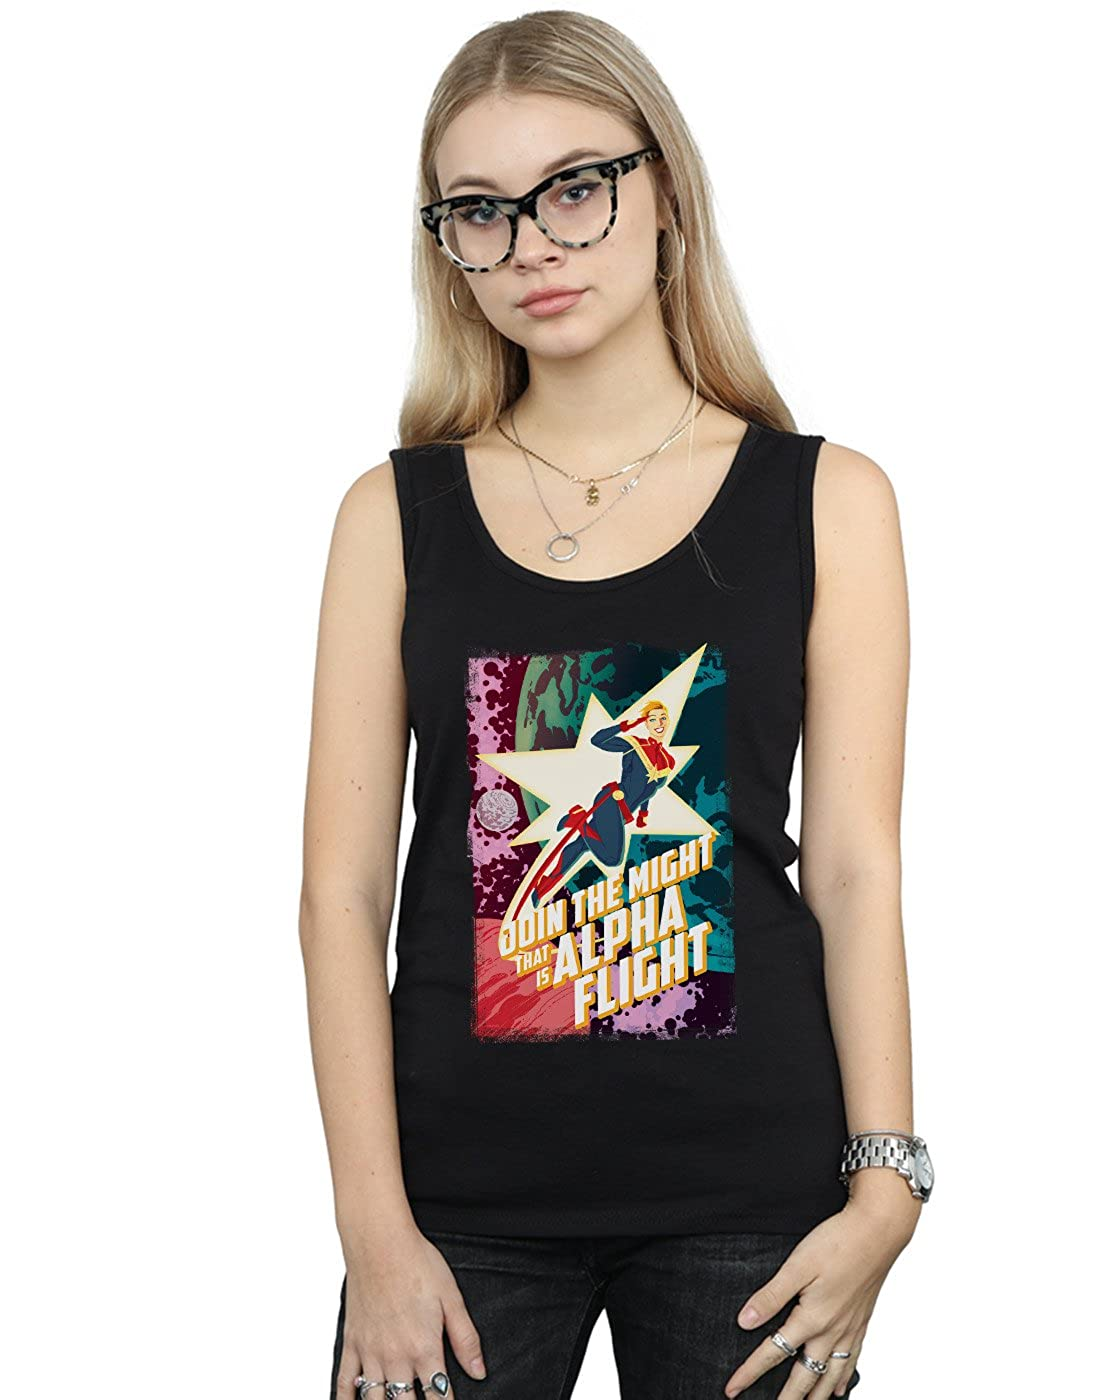 27d2a2b639b5a3 Amazon.com  Marvel Women s Captain Marvel Alpha Flight Tank Top Black  Medium  Clothing